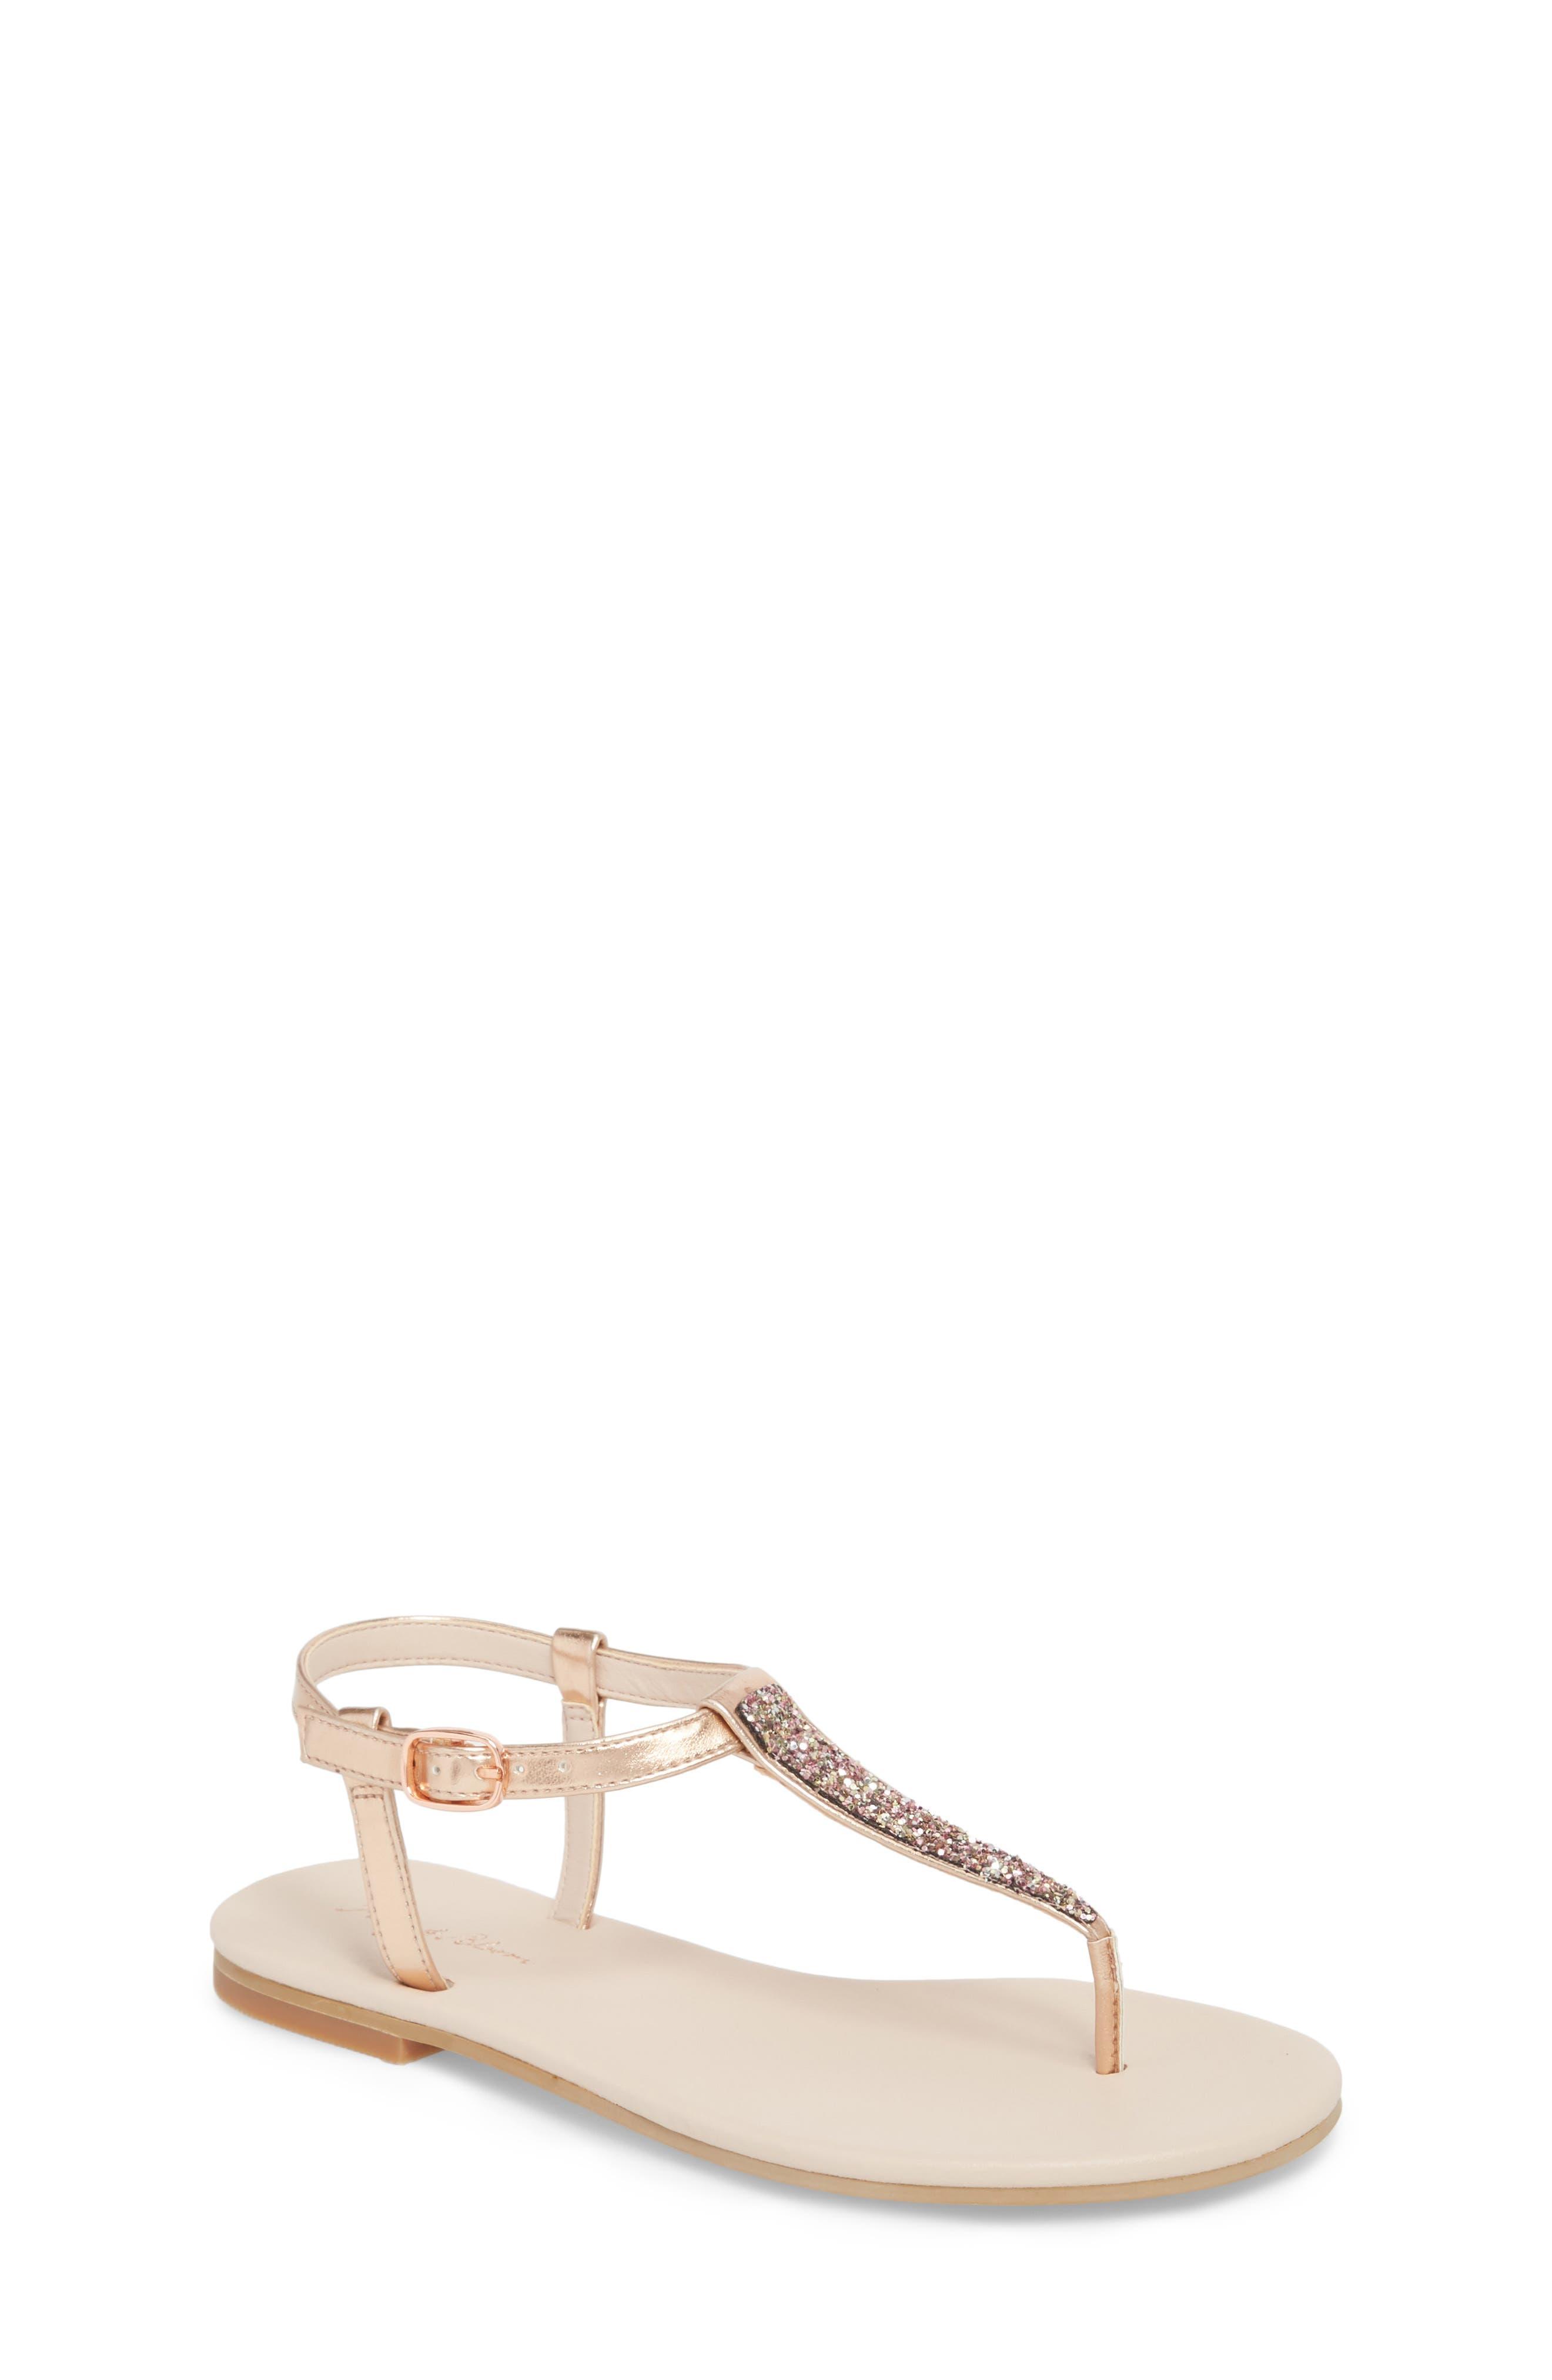 Noe Glitter T-Strap Sandal Sandal,                         Main,                         color, ROSE GOLD FAUX LEA